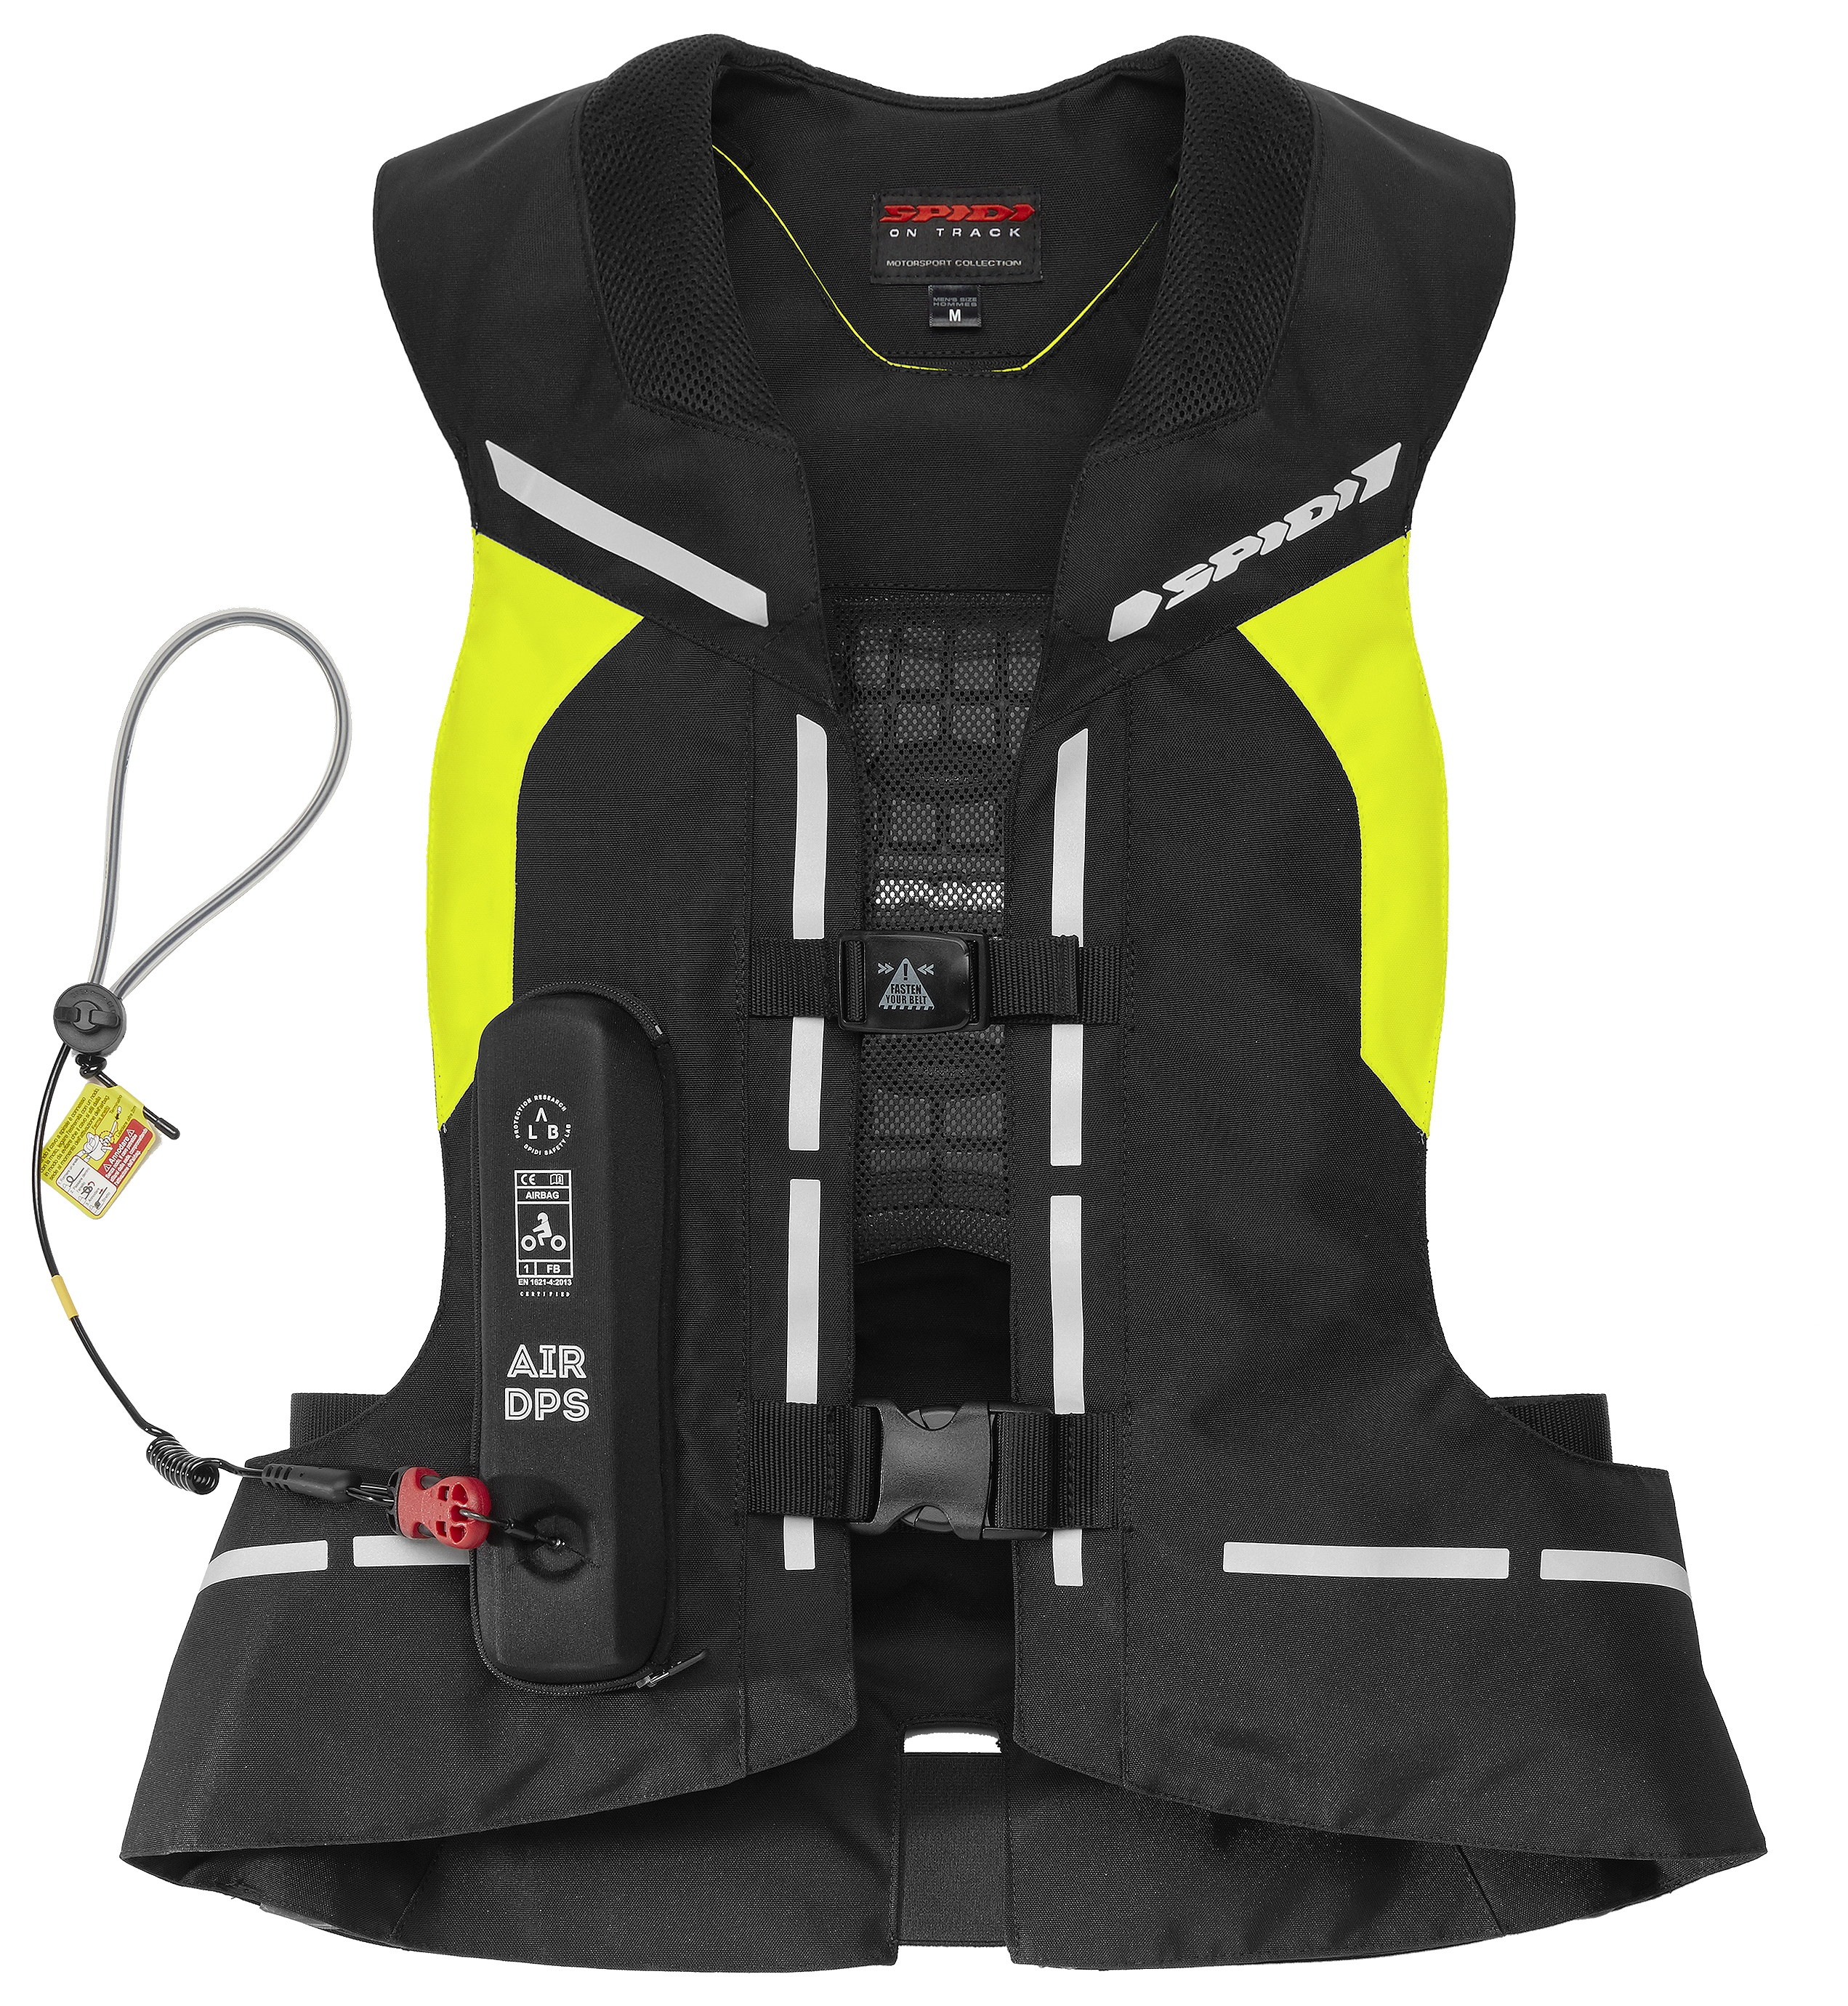 Spidi airbag vest modified agi for net investment income